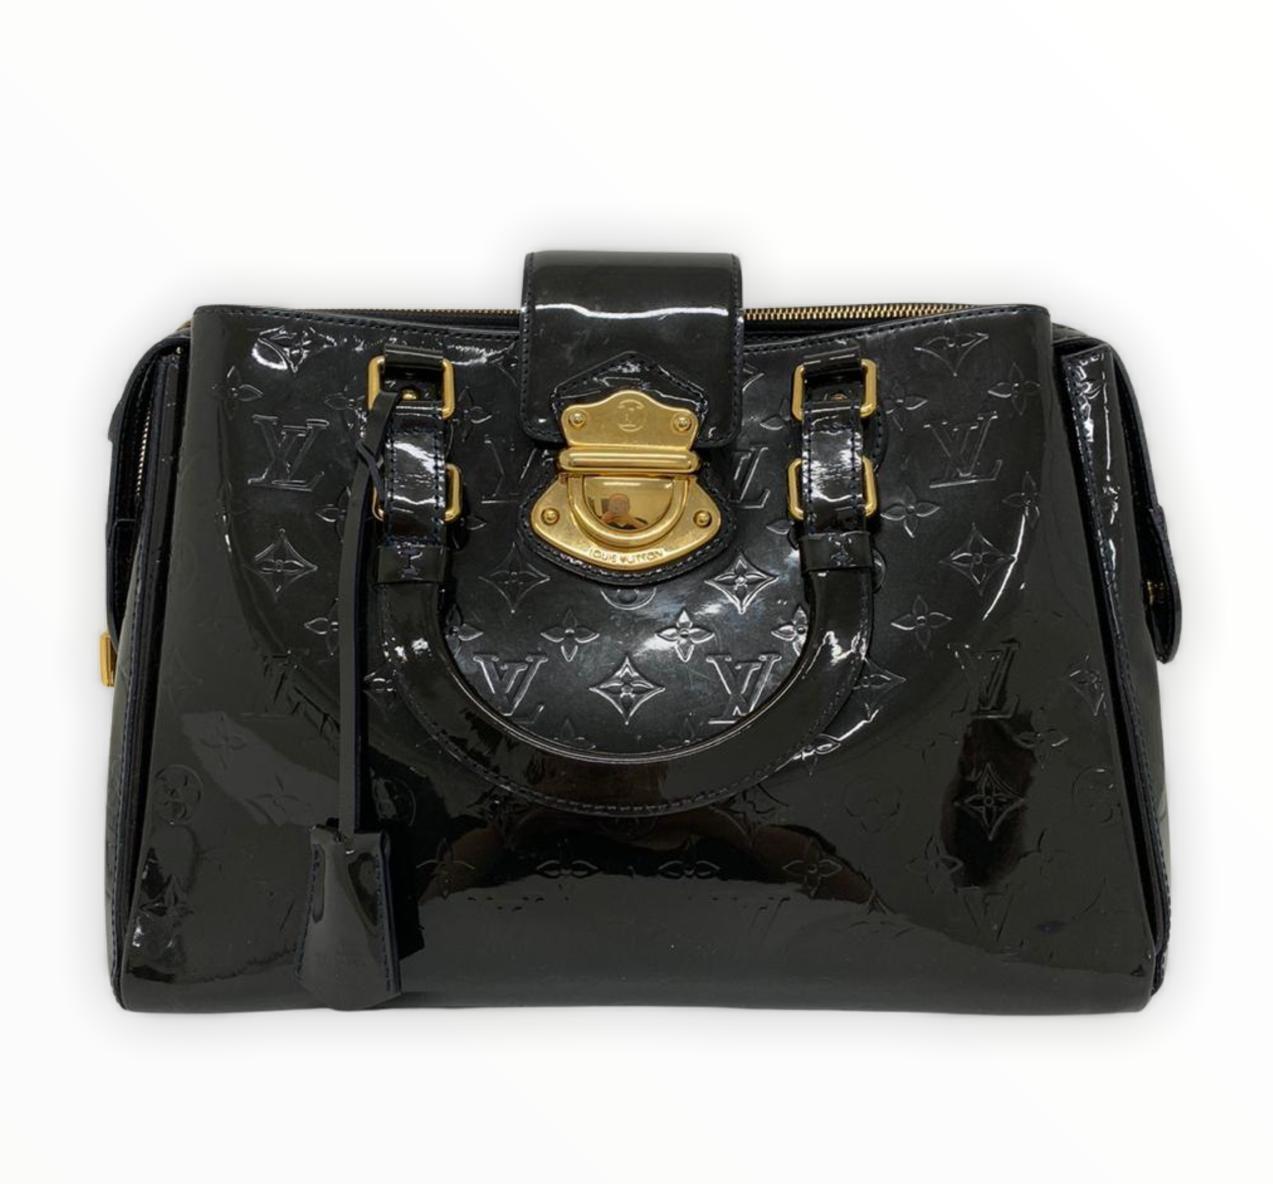 Bolsa Louis Vuitton Melrose Avenue Preta